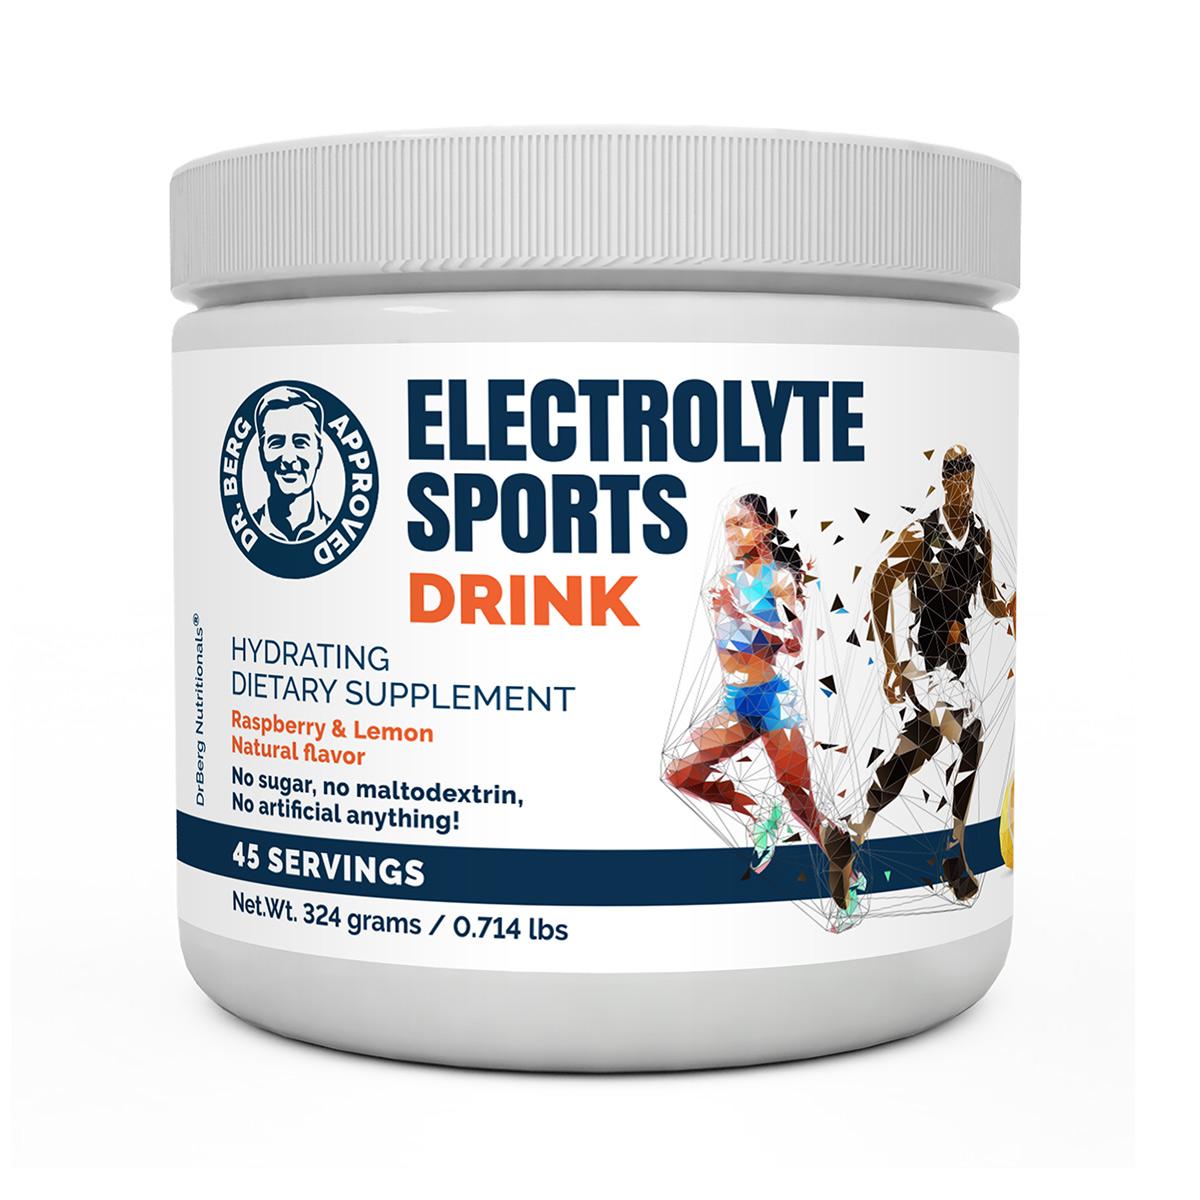 Electrolyte sports drink